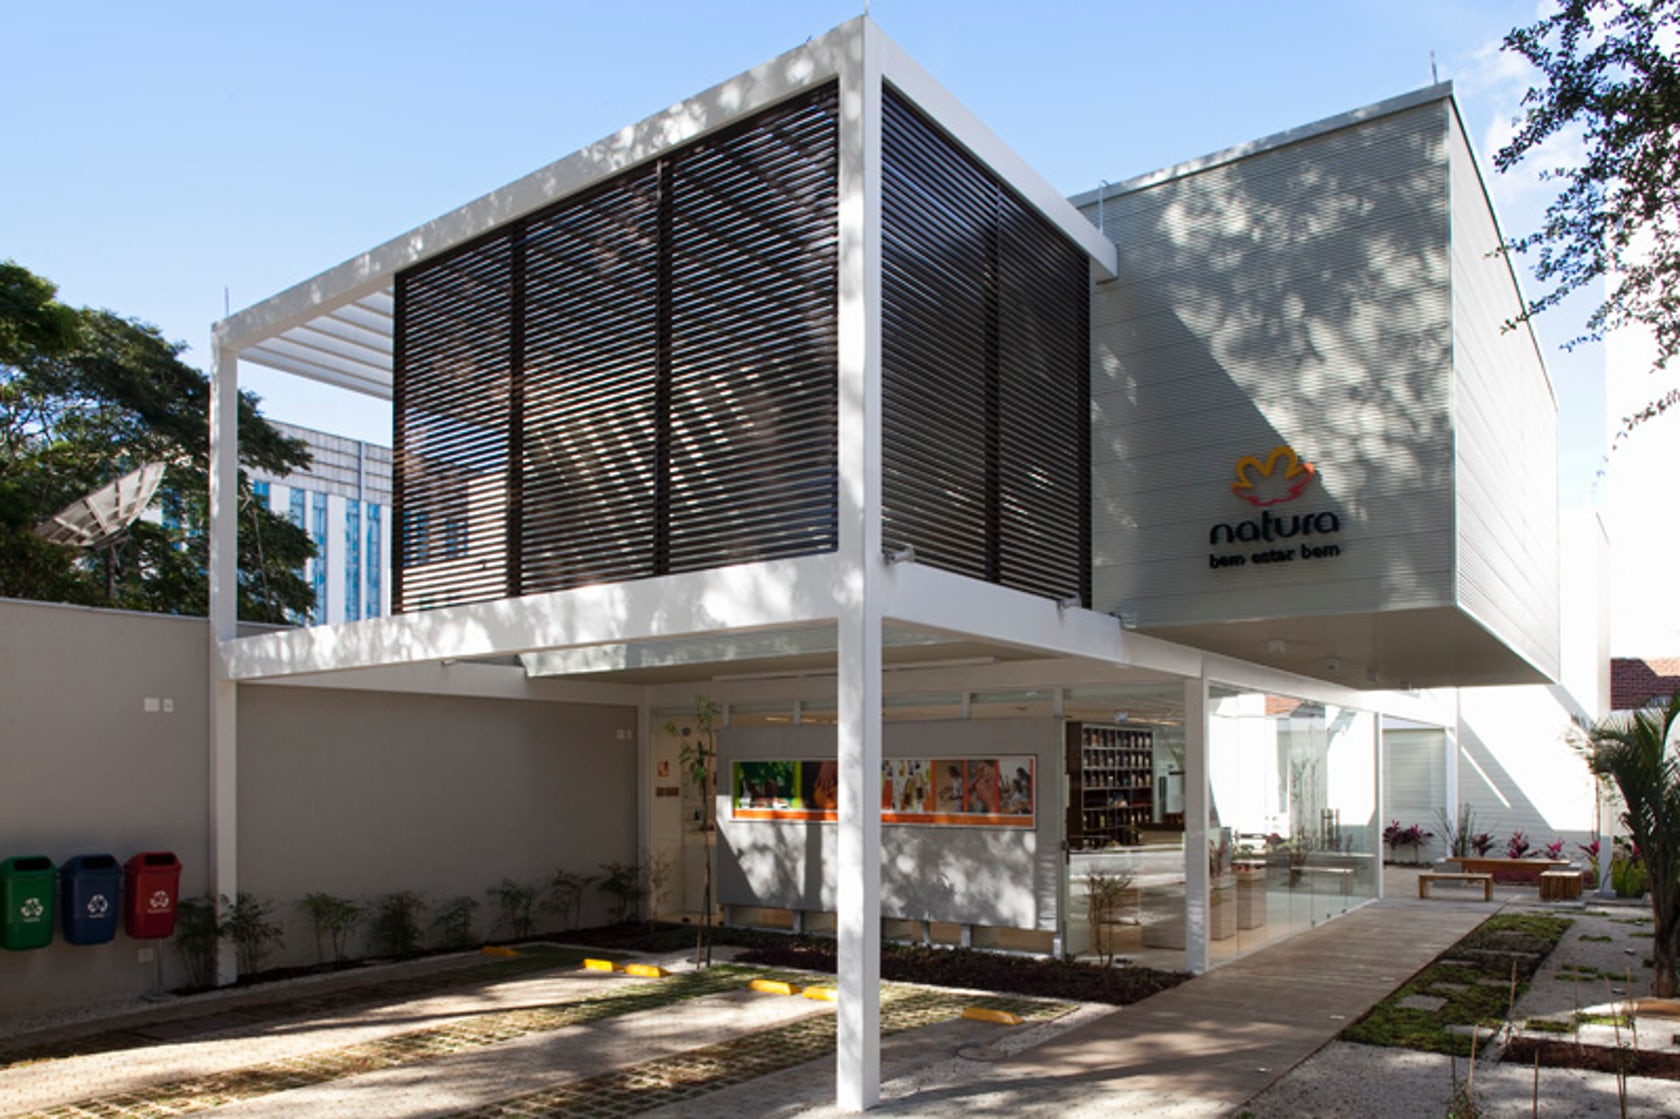 Natura s showroom santo andr architizer - Casa estructura metalica ...